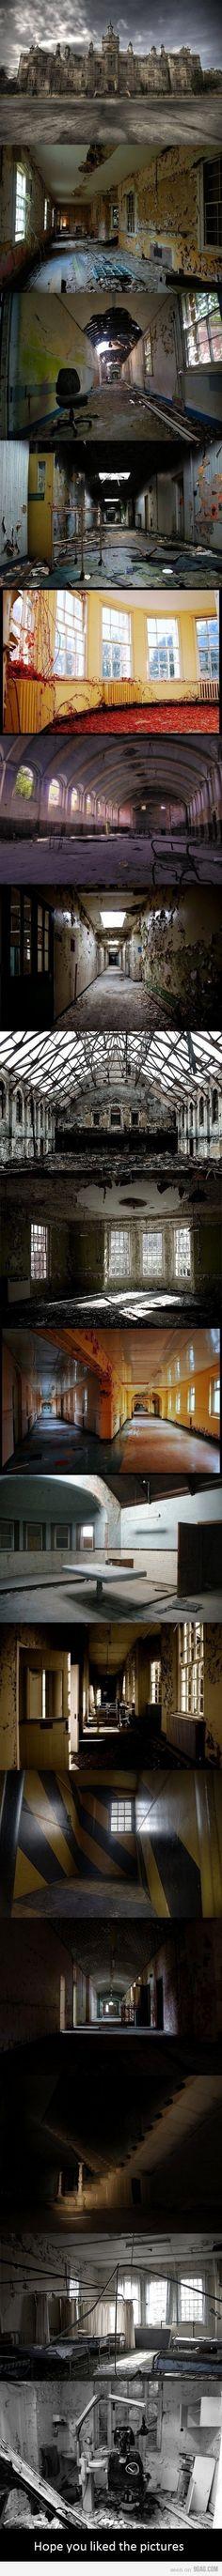 Abandoned Mental Asylum.